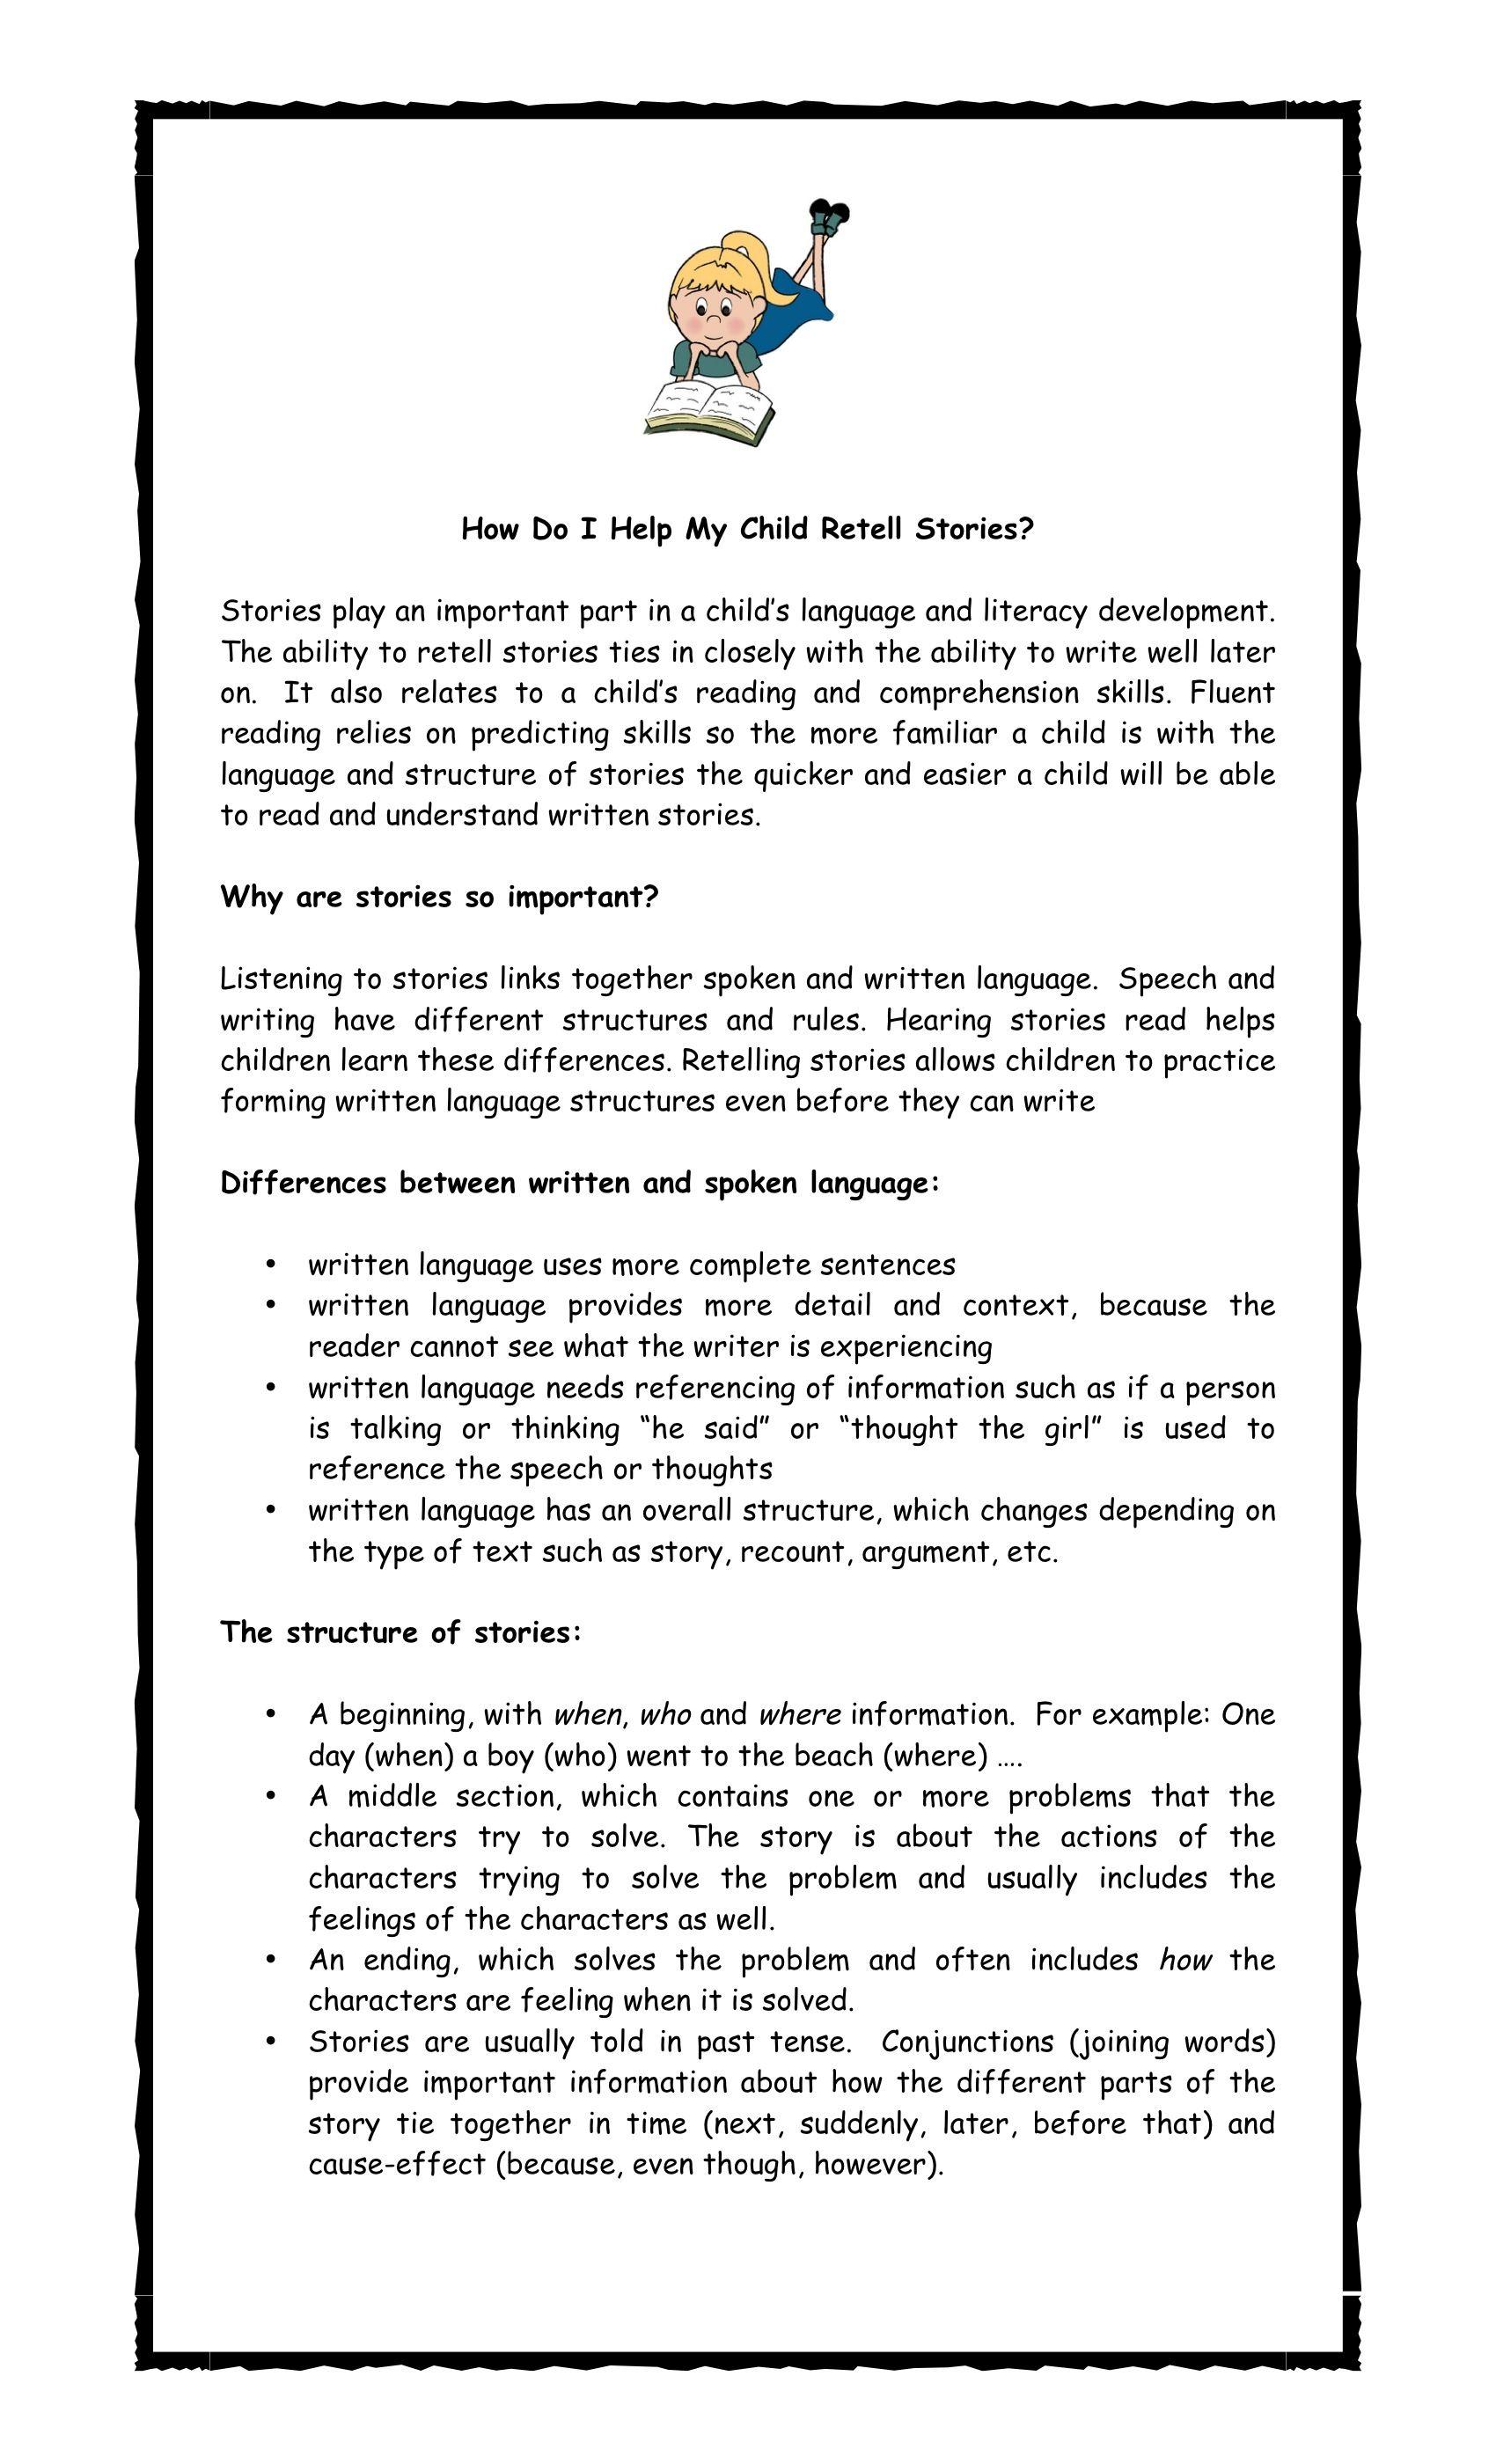 How To Teach Children To Retell Stories 1